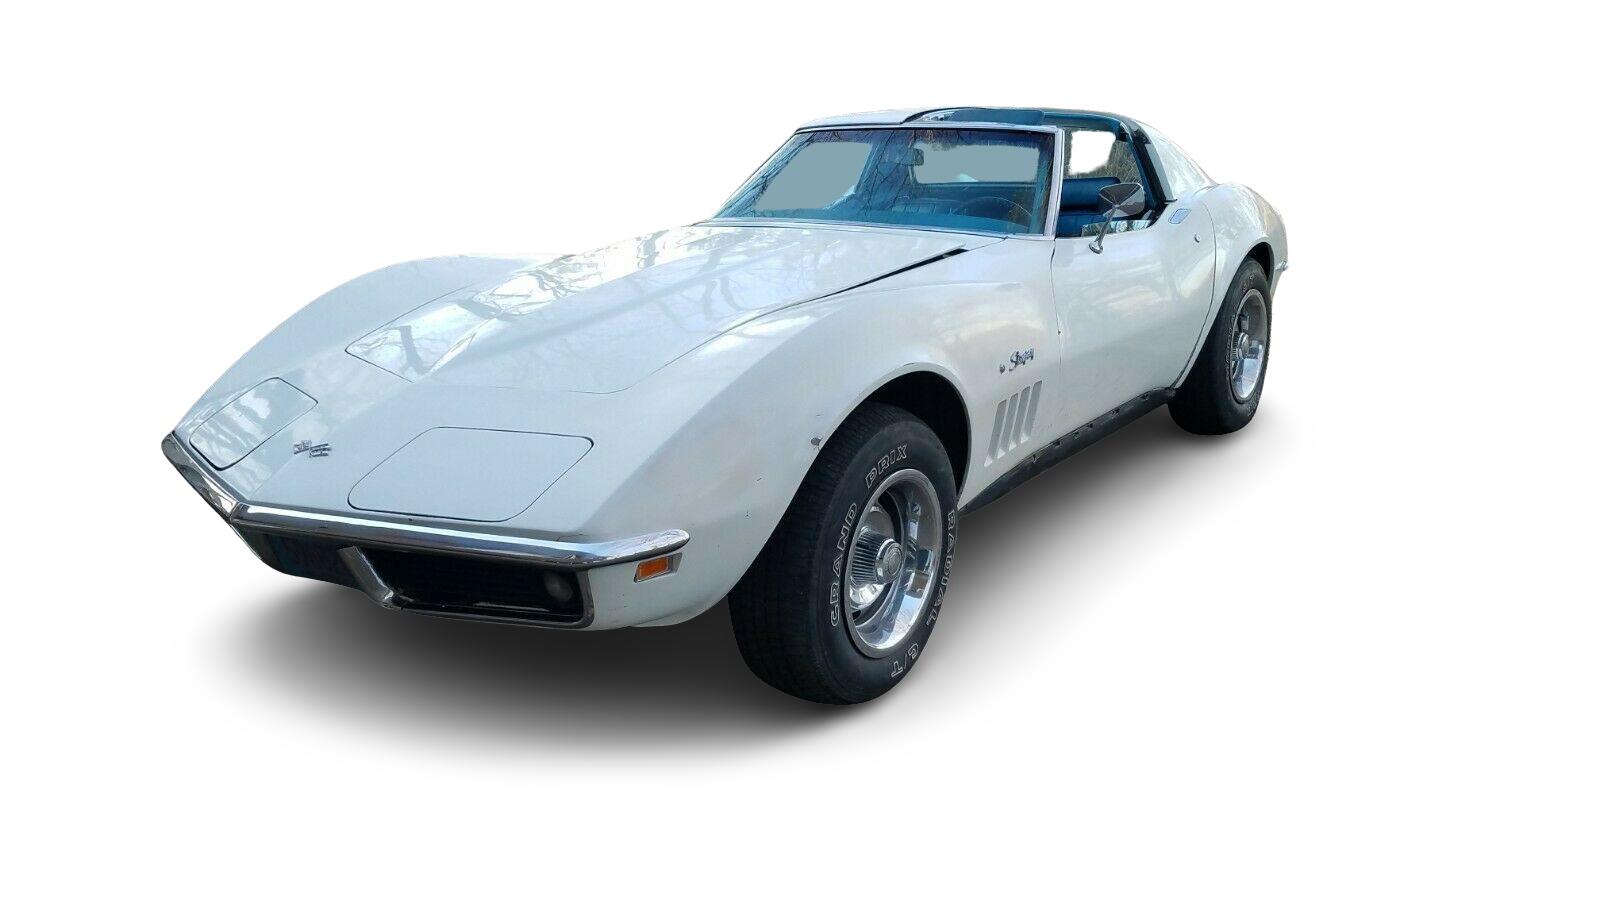 1969 Chevrolet Corvette C3 Coupe